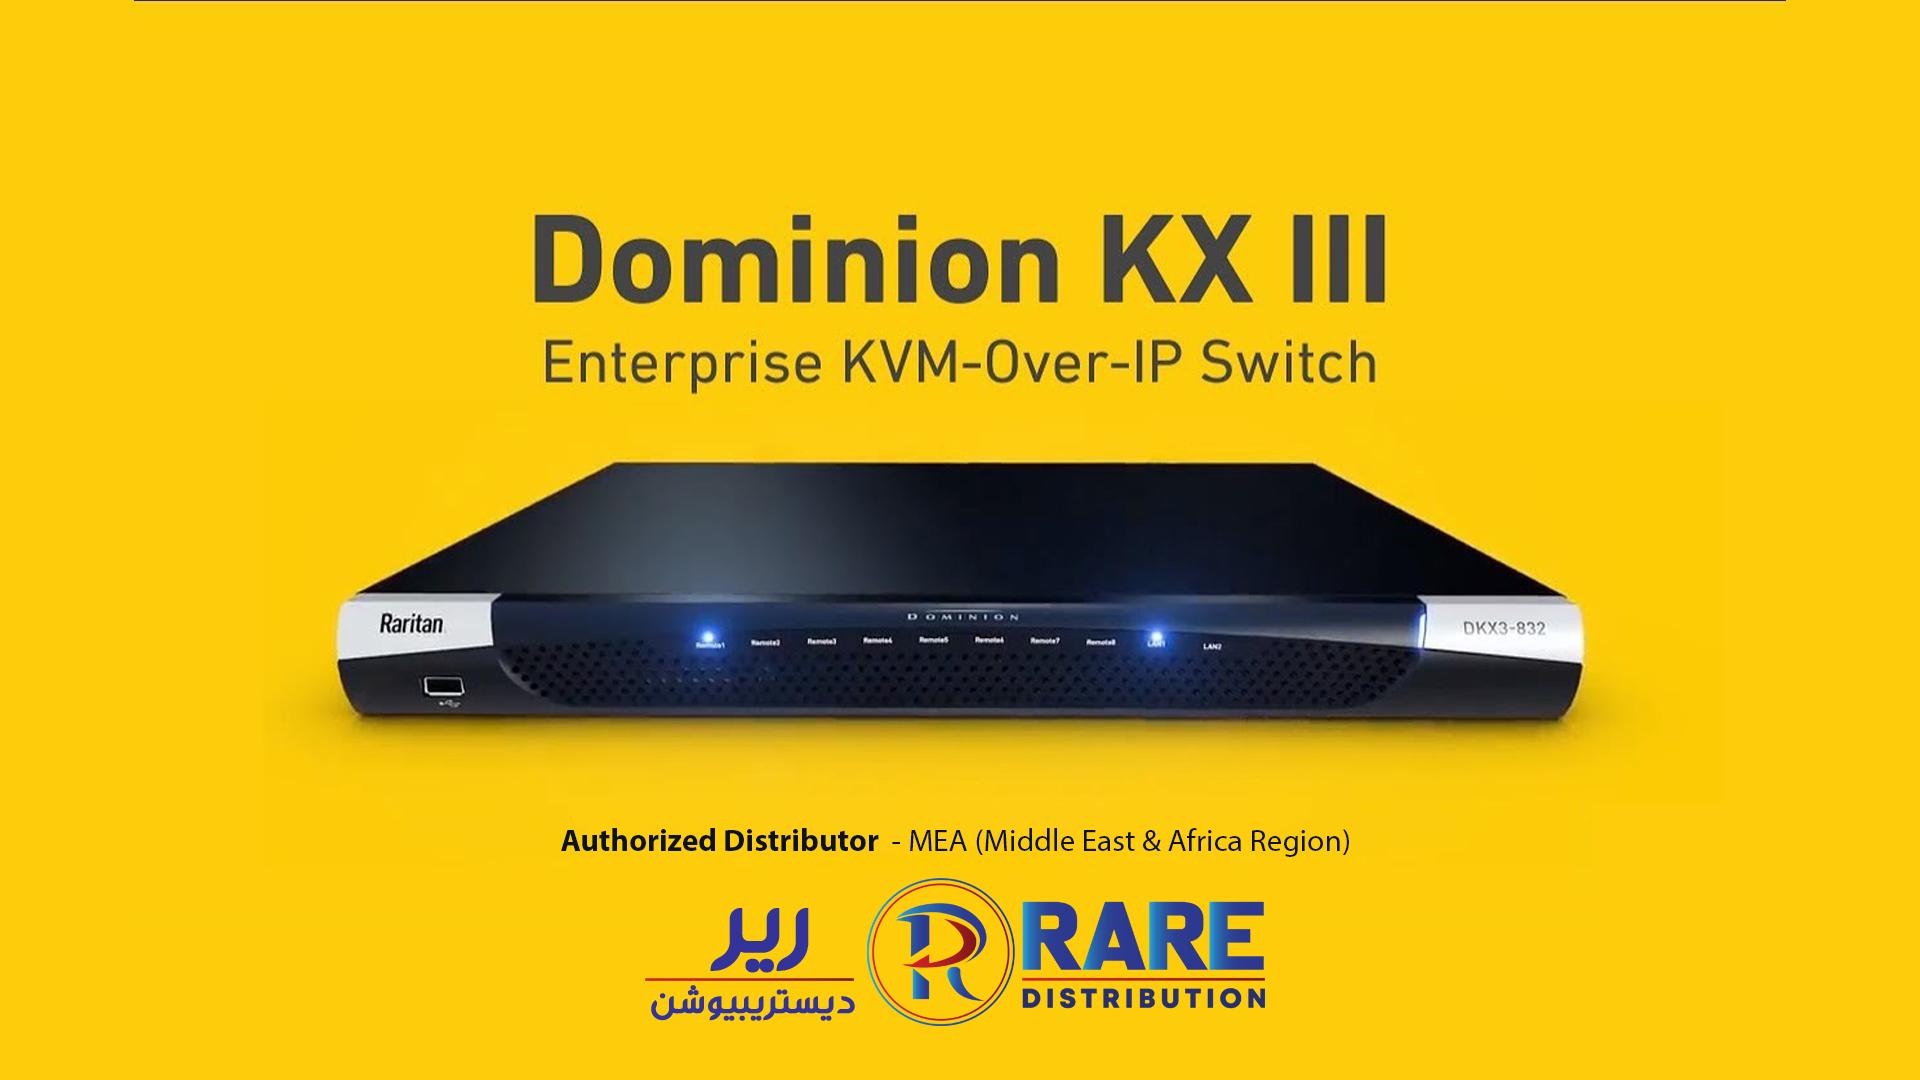 Raritan Dominion KX III | World's Leading KVM over IP Switch